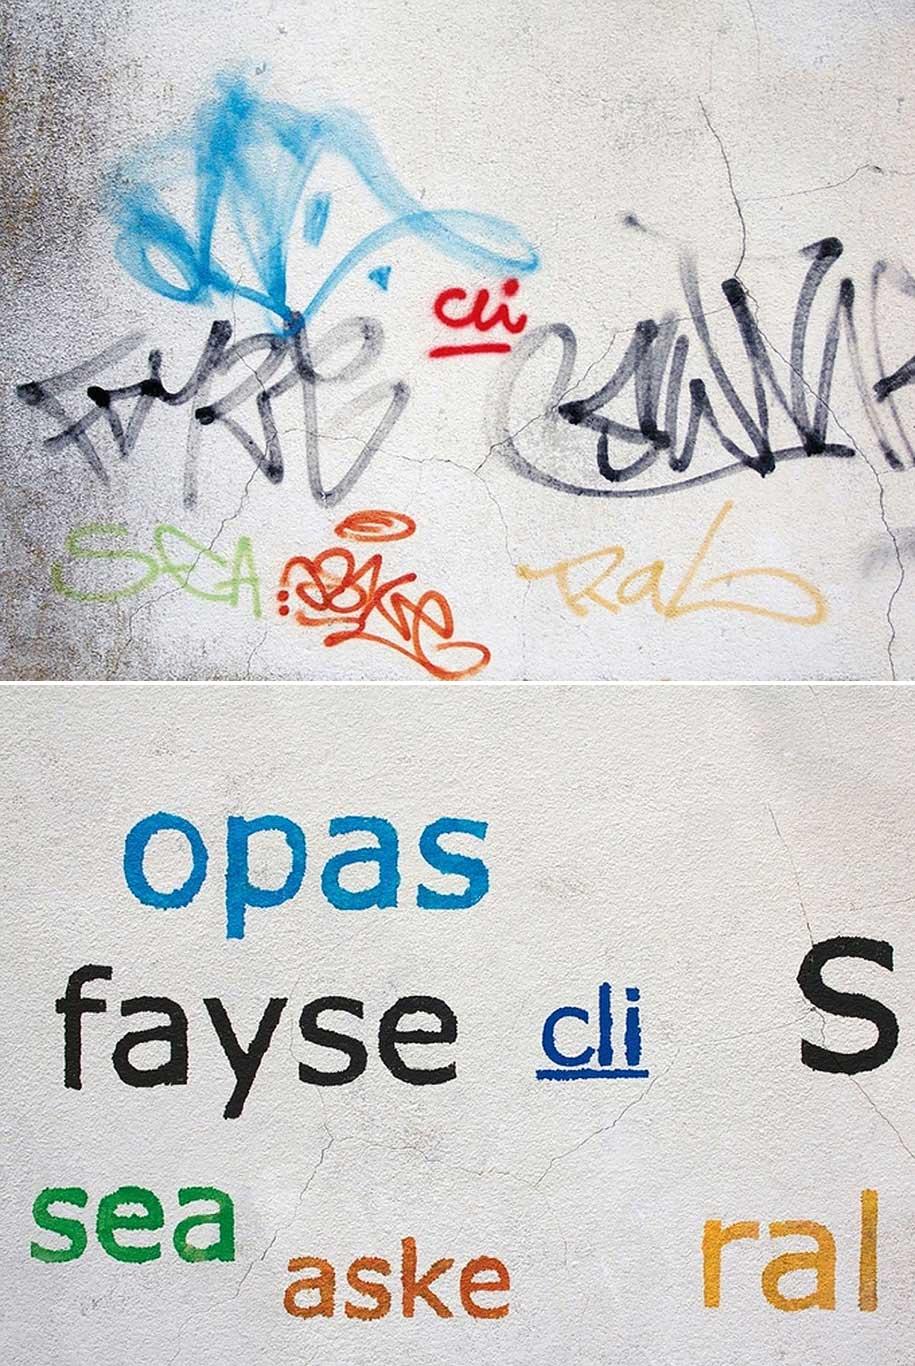 Mathieu Tremblin macht Graffiti-Tags leserlich Mathieu-Tremblin-tag-clouds-graffiti_08